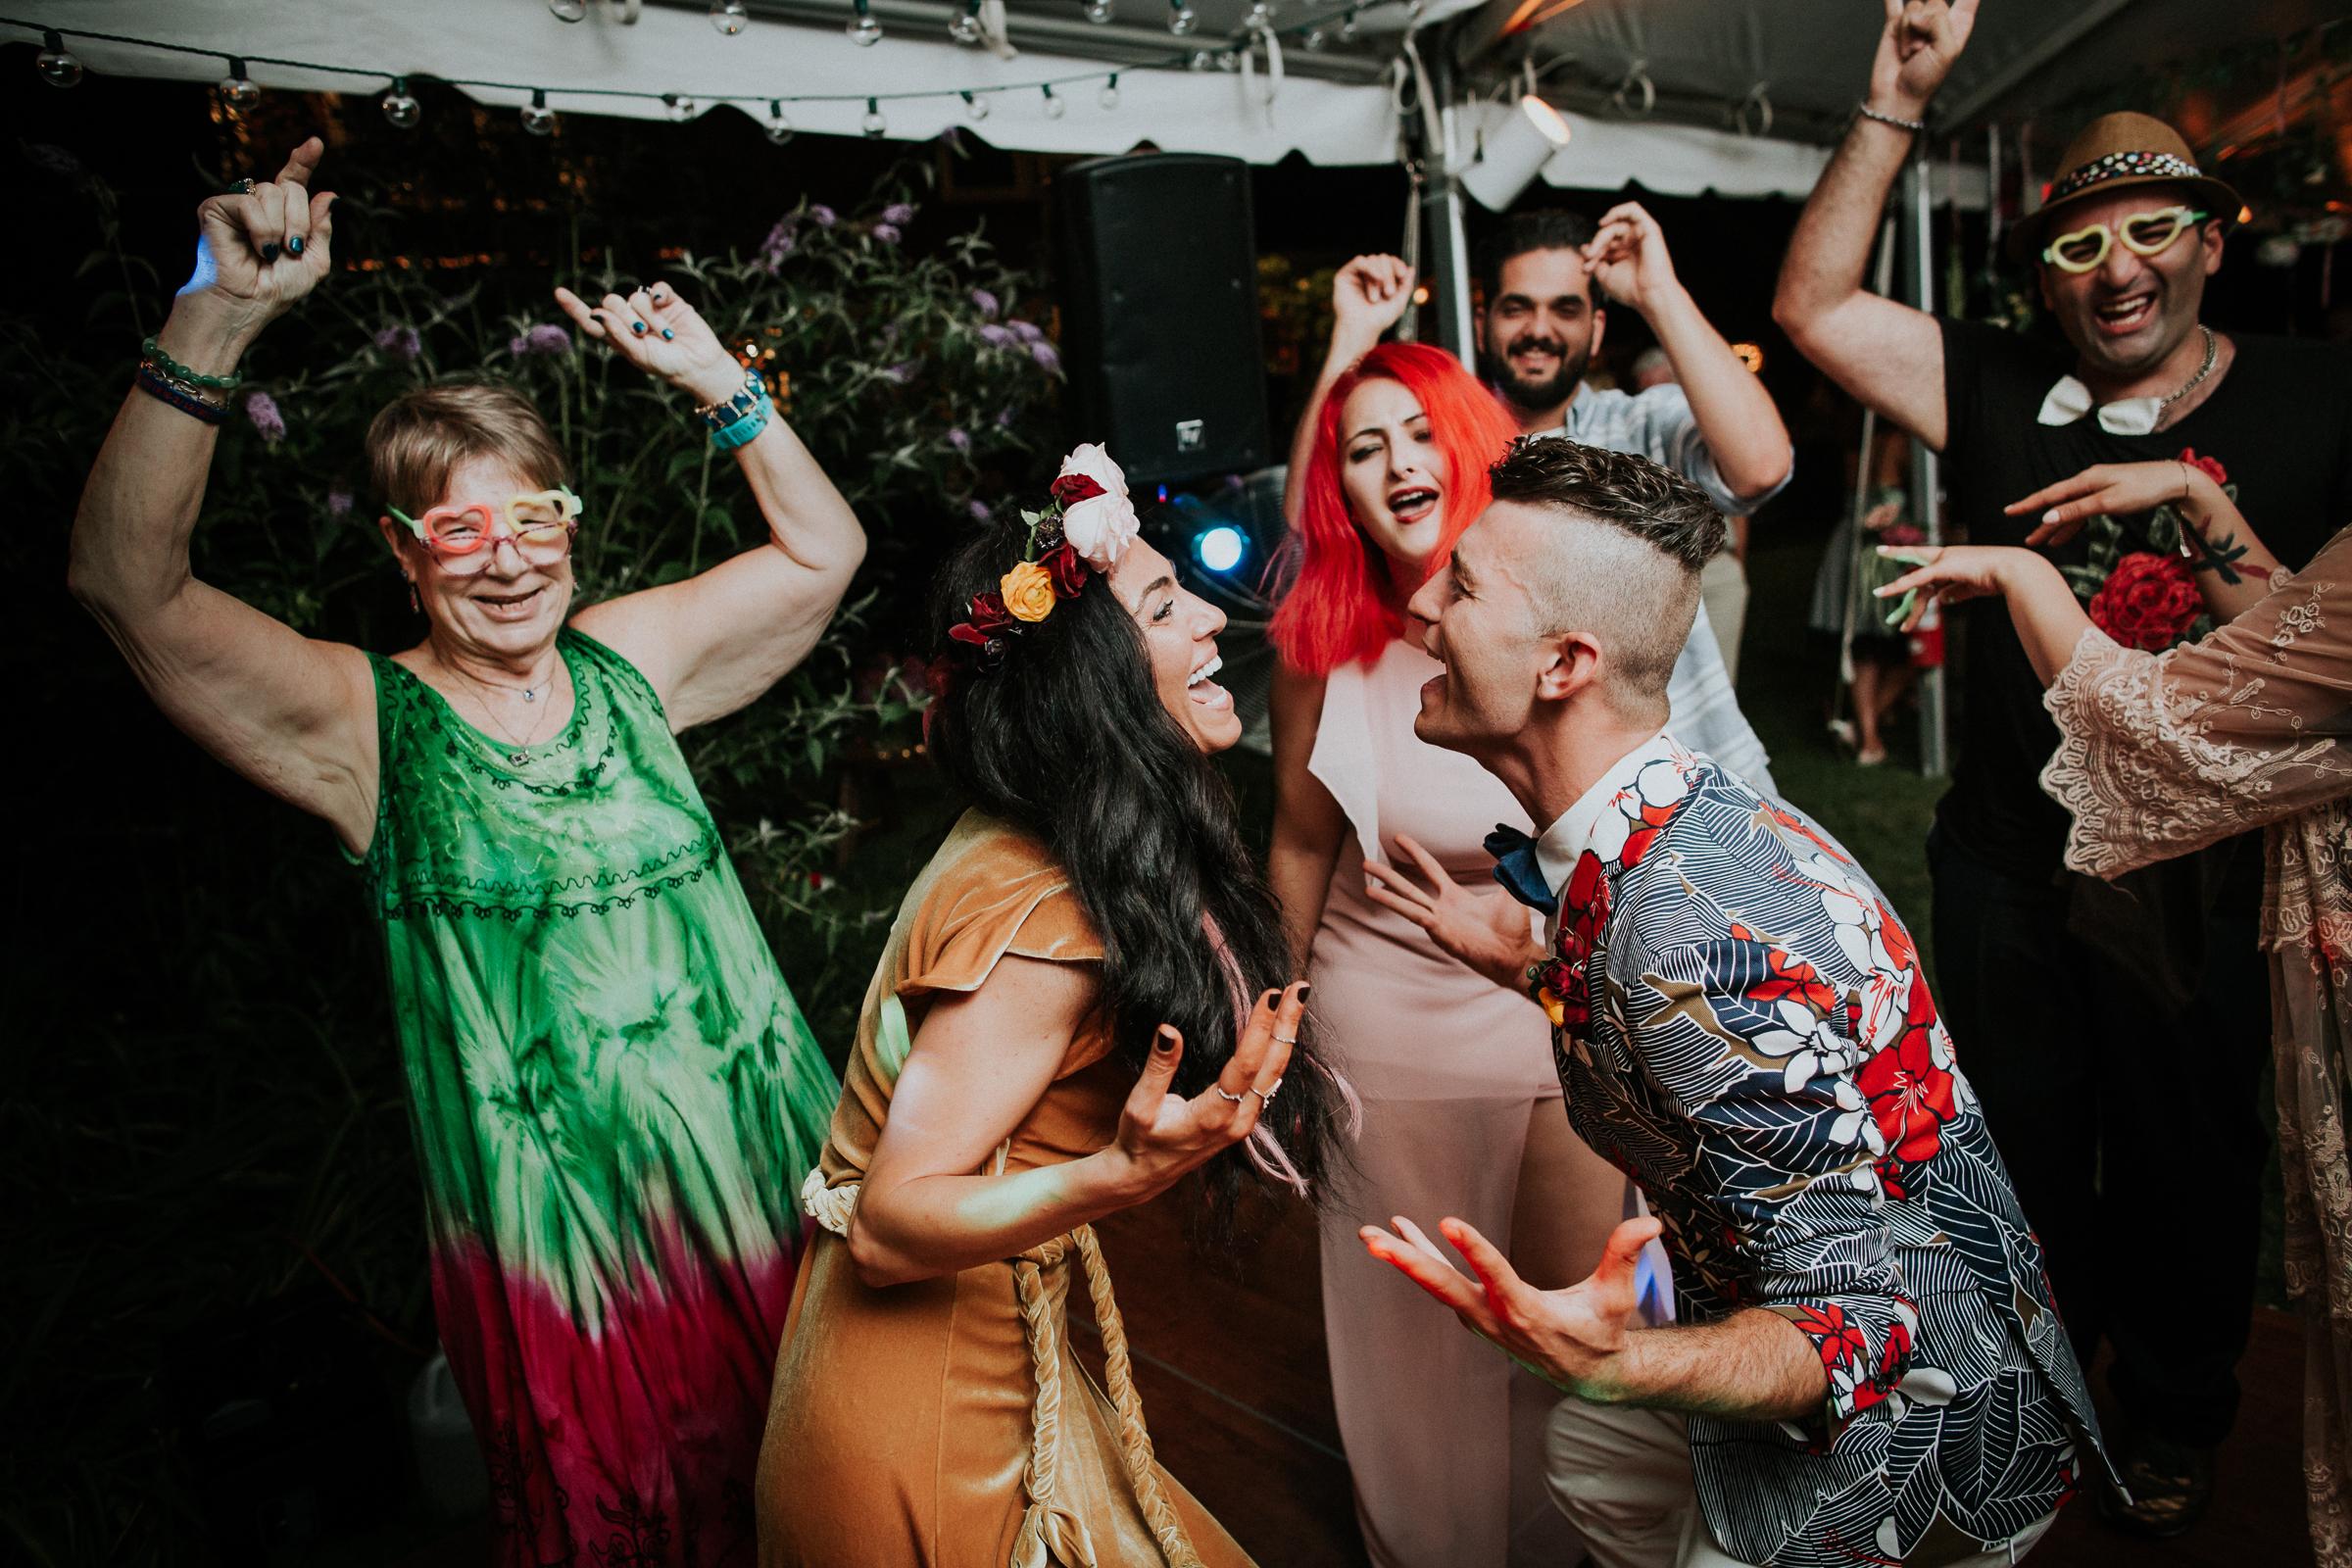 Backyard-Intimate-Adventurous-Destination-Wedding-Darien-Connecticut-Documentary-Wedding-Photography-136.jpg